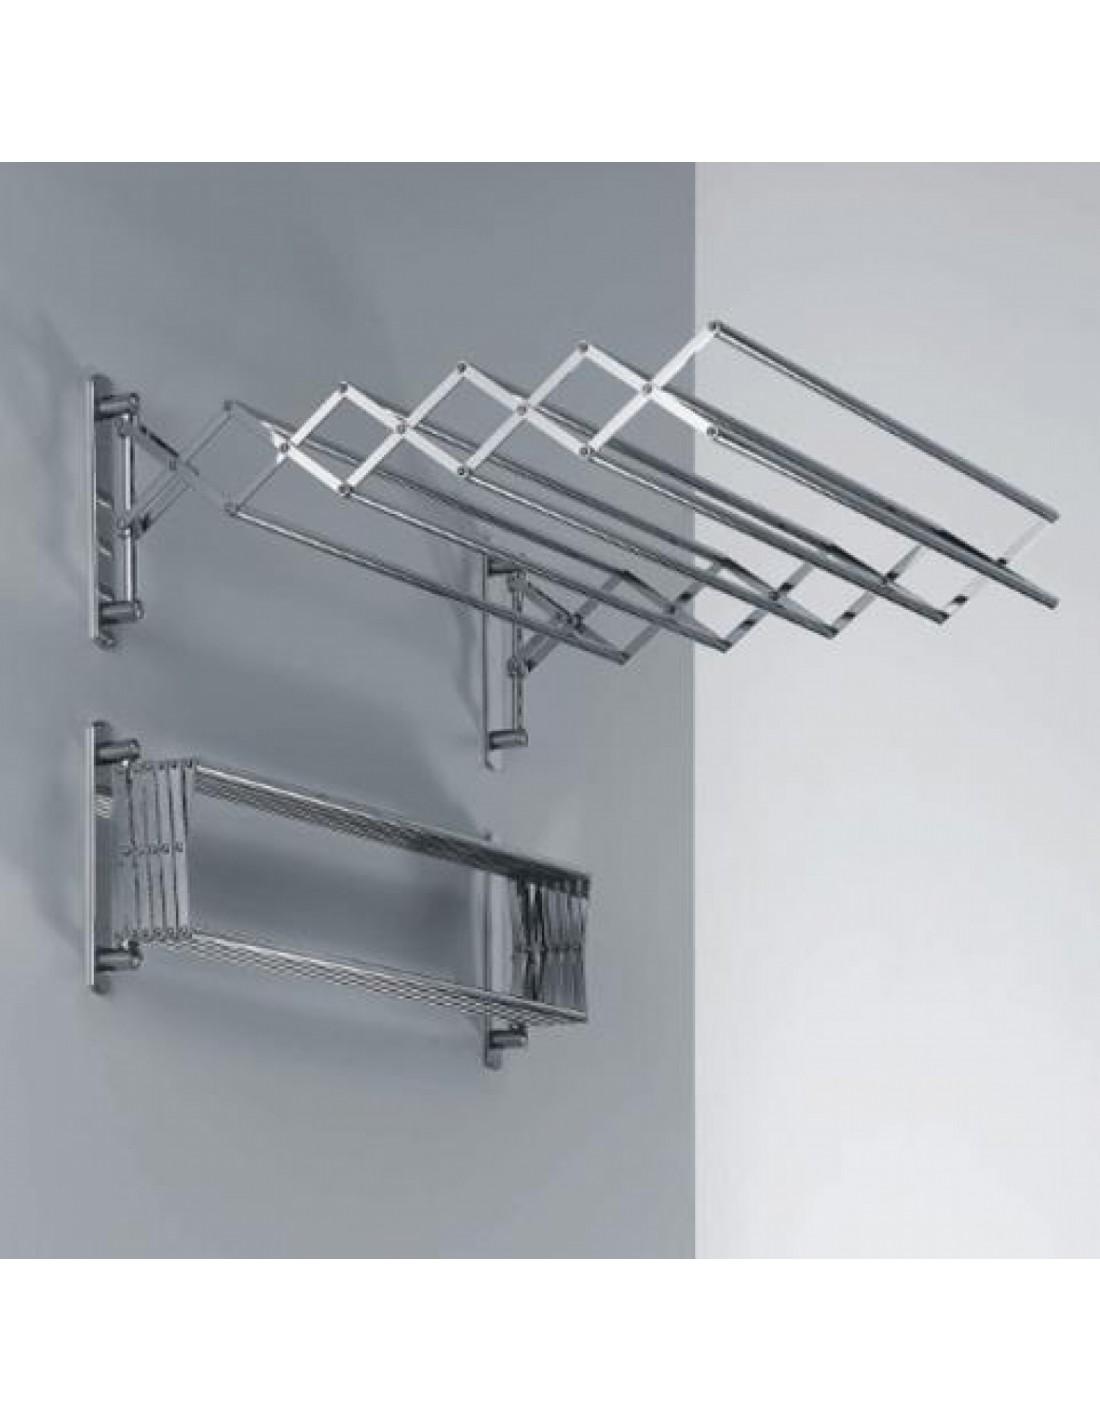 porte serviettes extensible. Black Bedroom Furniture Sets. Home Design Ideas